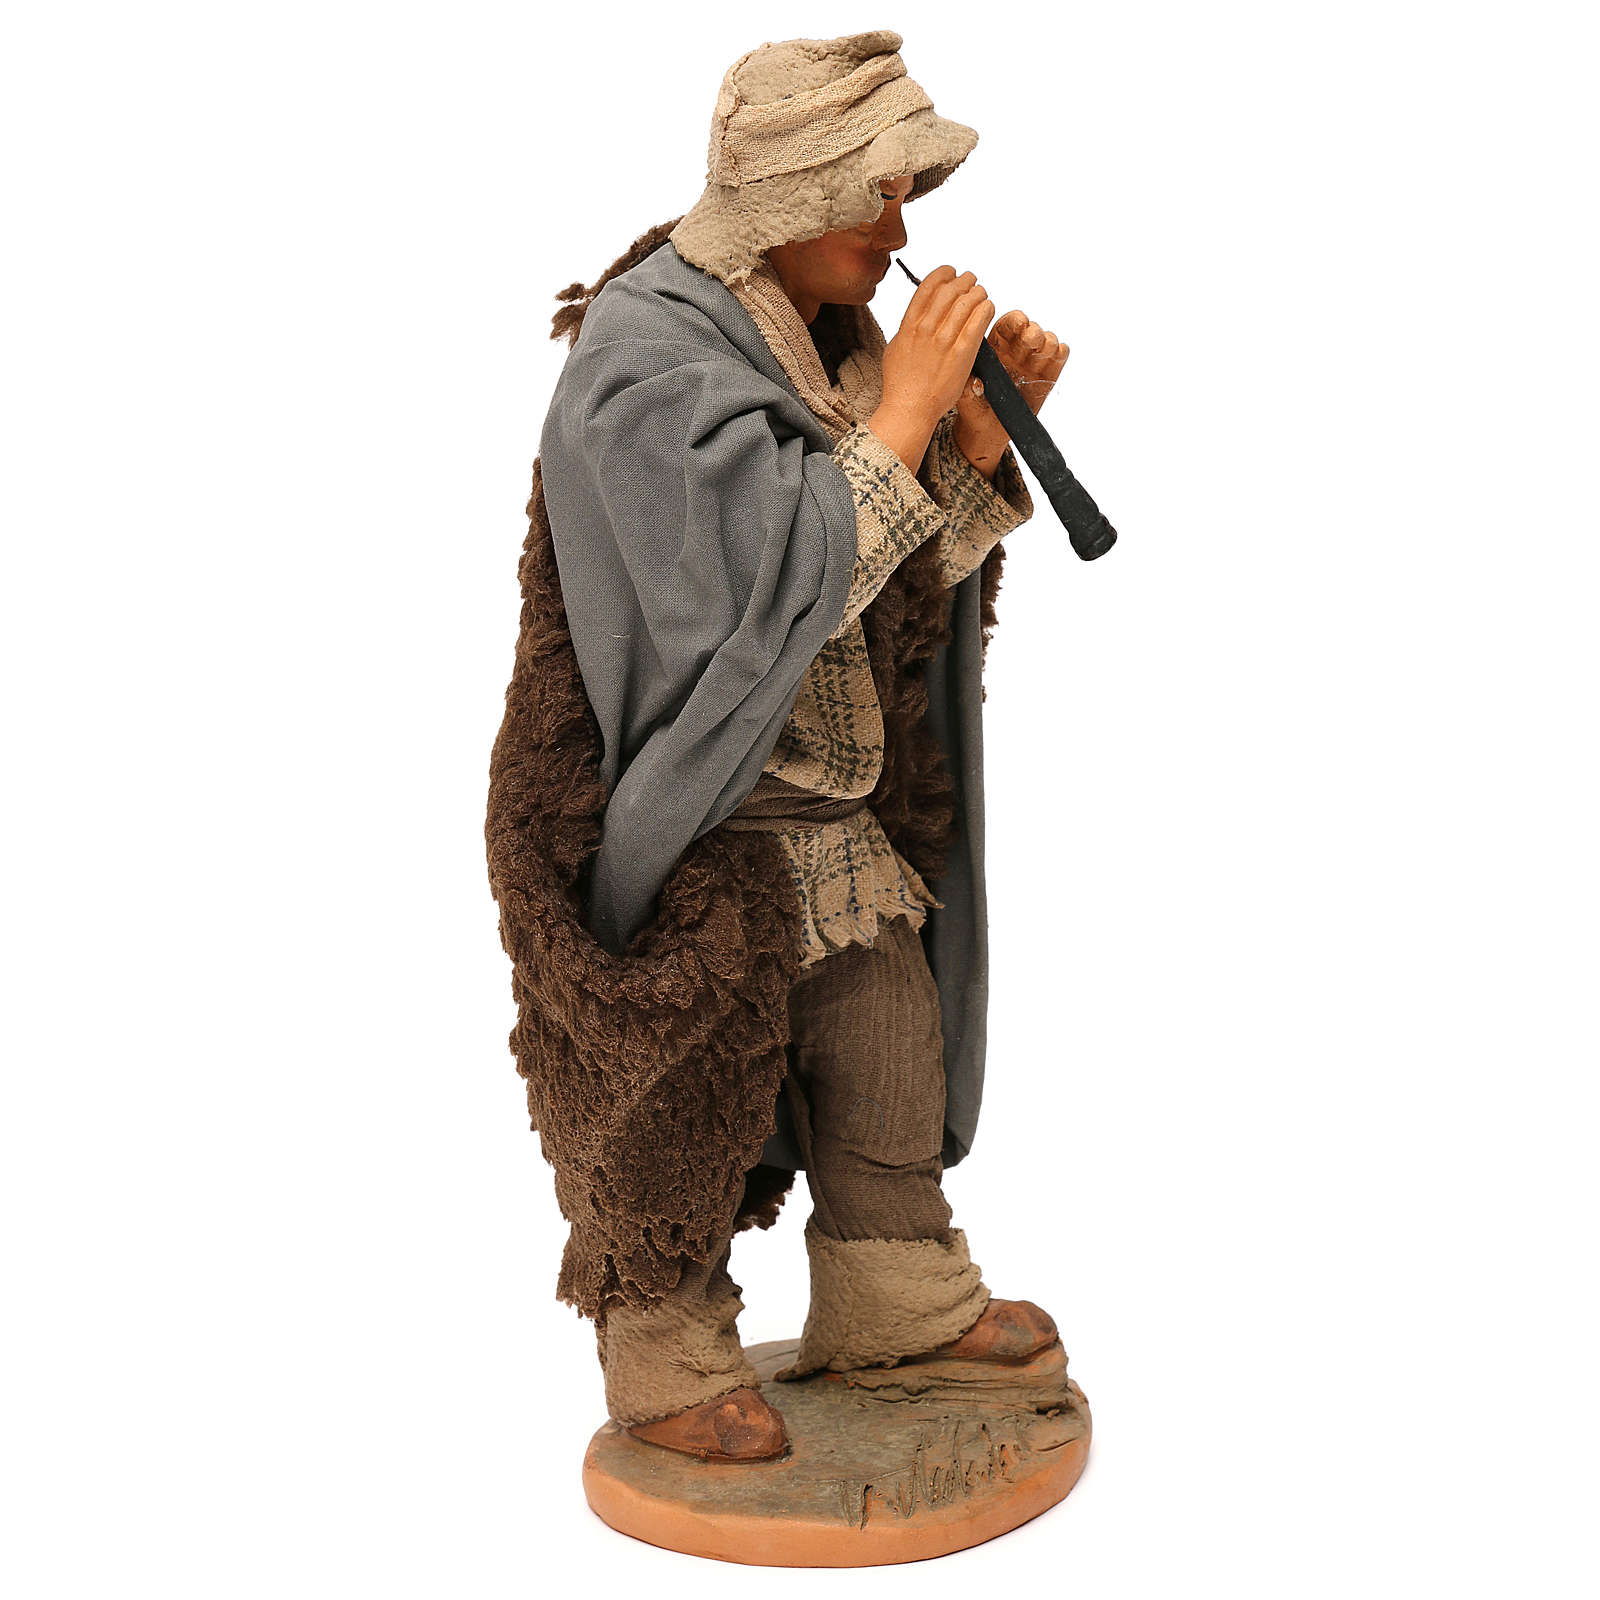 STOCK Flautista vestido terracota cm 30 Belén Napolitano 4